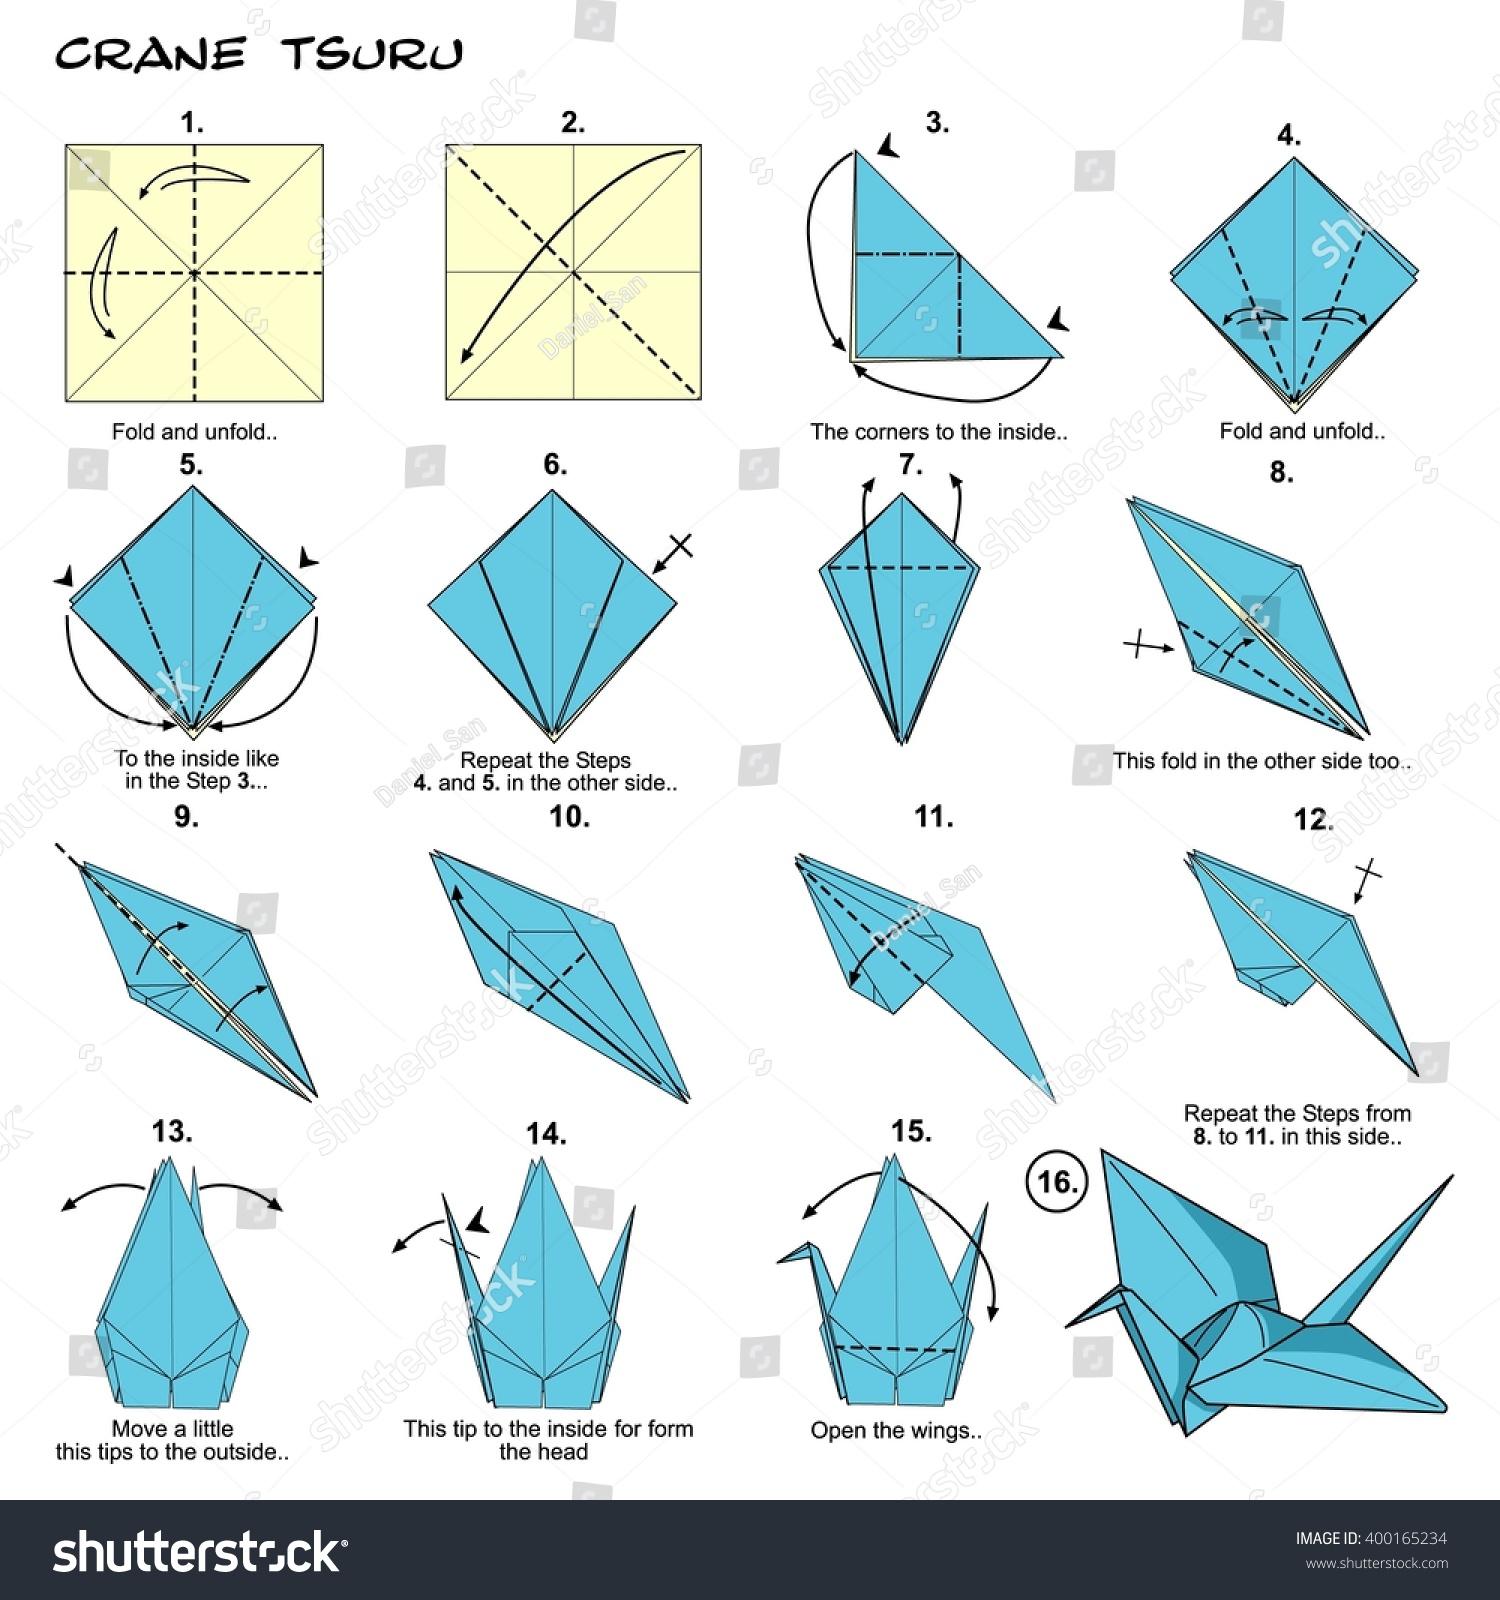 Origami Traditional Japan Crane Tsuru Diagram Stock Illustration